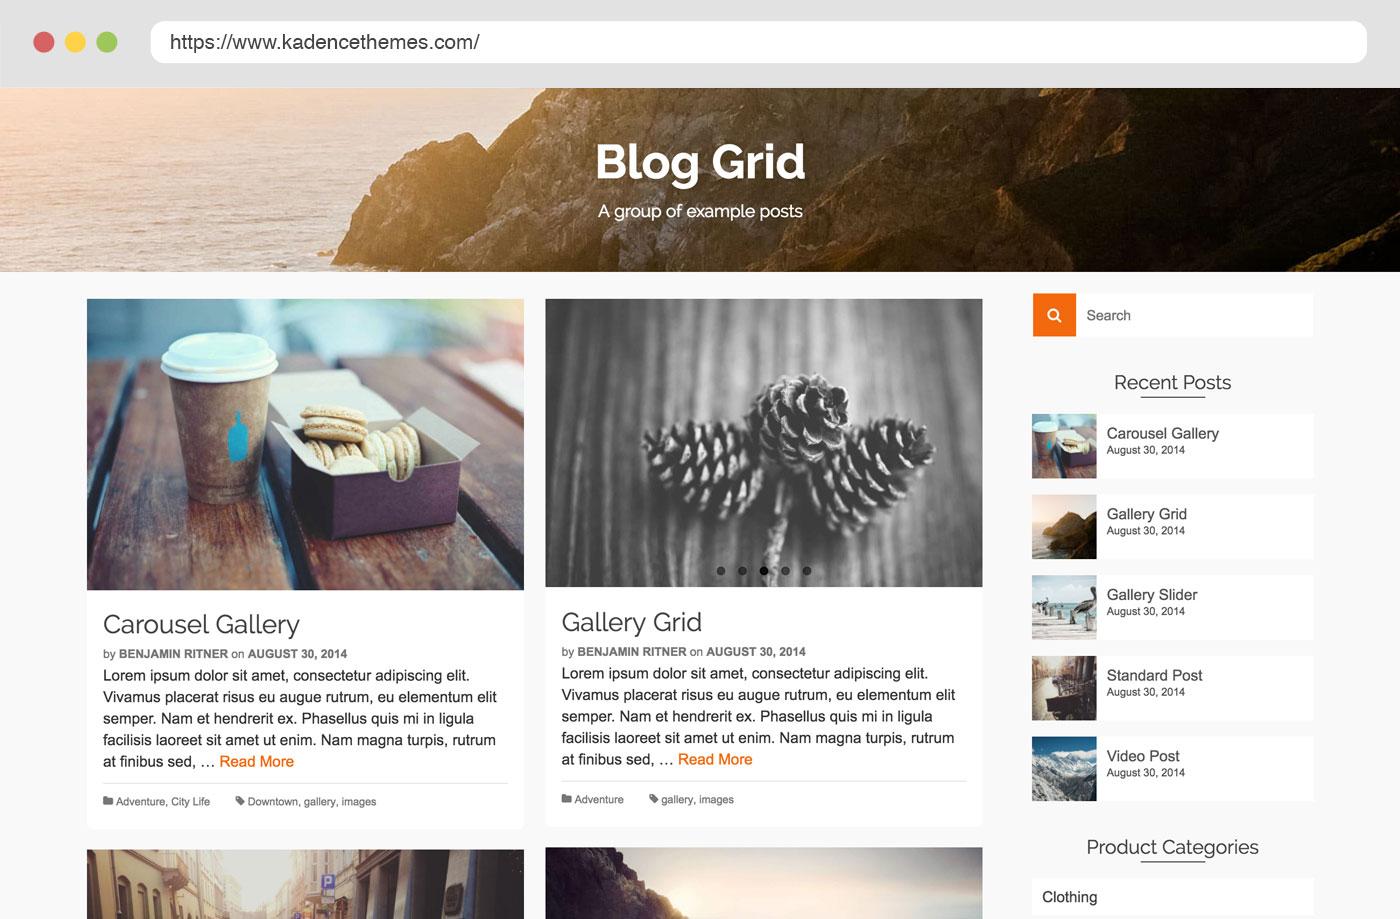 Pinnacle - Free Wordpress Theme by Kadence Themes